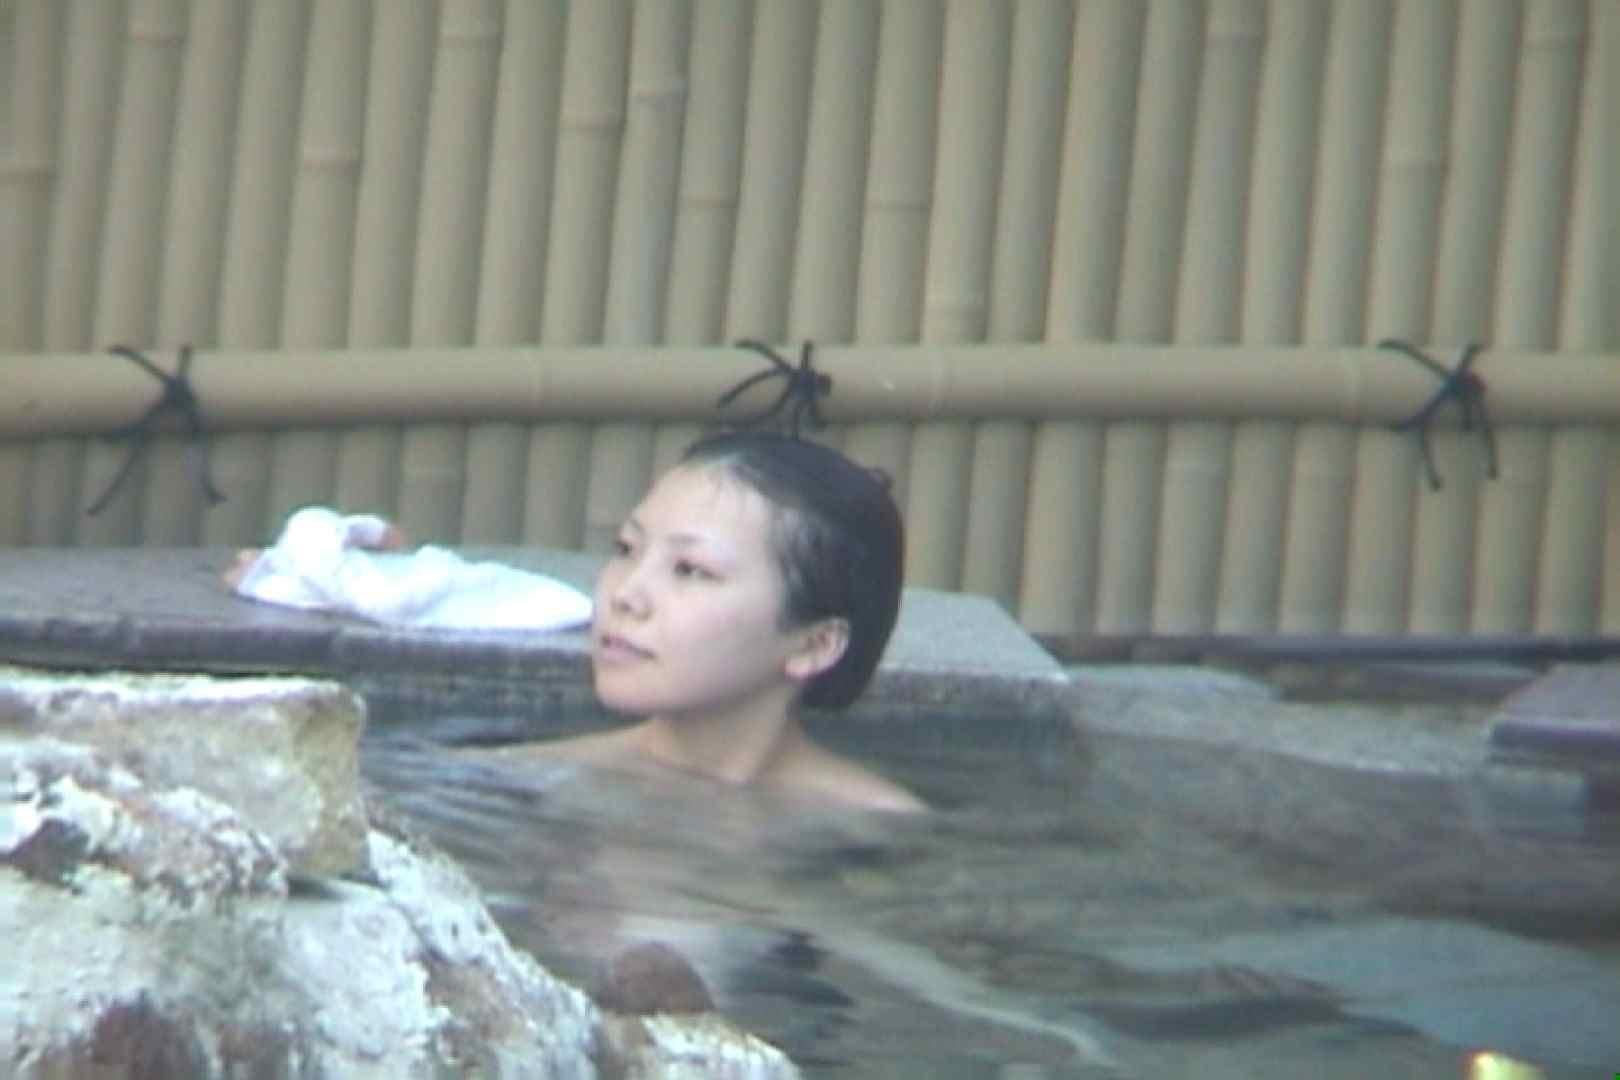 Aquaな露天風呂Vol.572 0  34連発 2